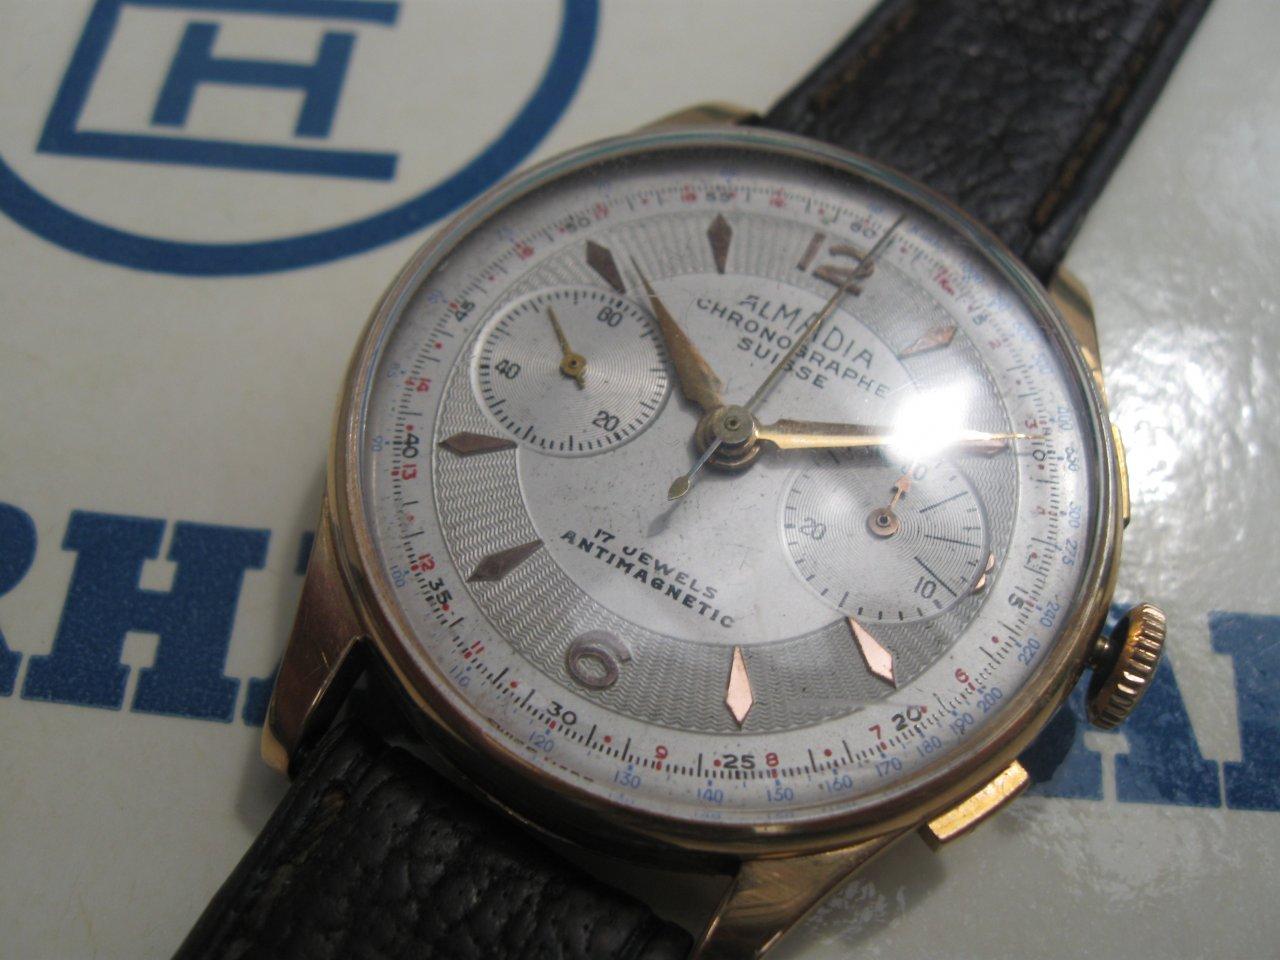 ALMADIA Chronograph Suisse Vintage Bronze Watch Dial ...